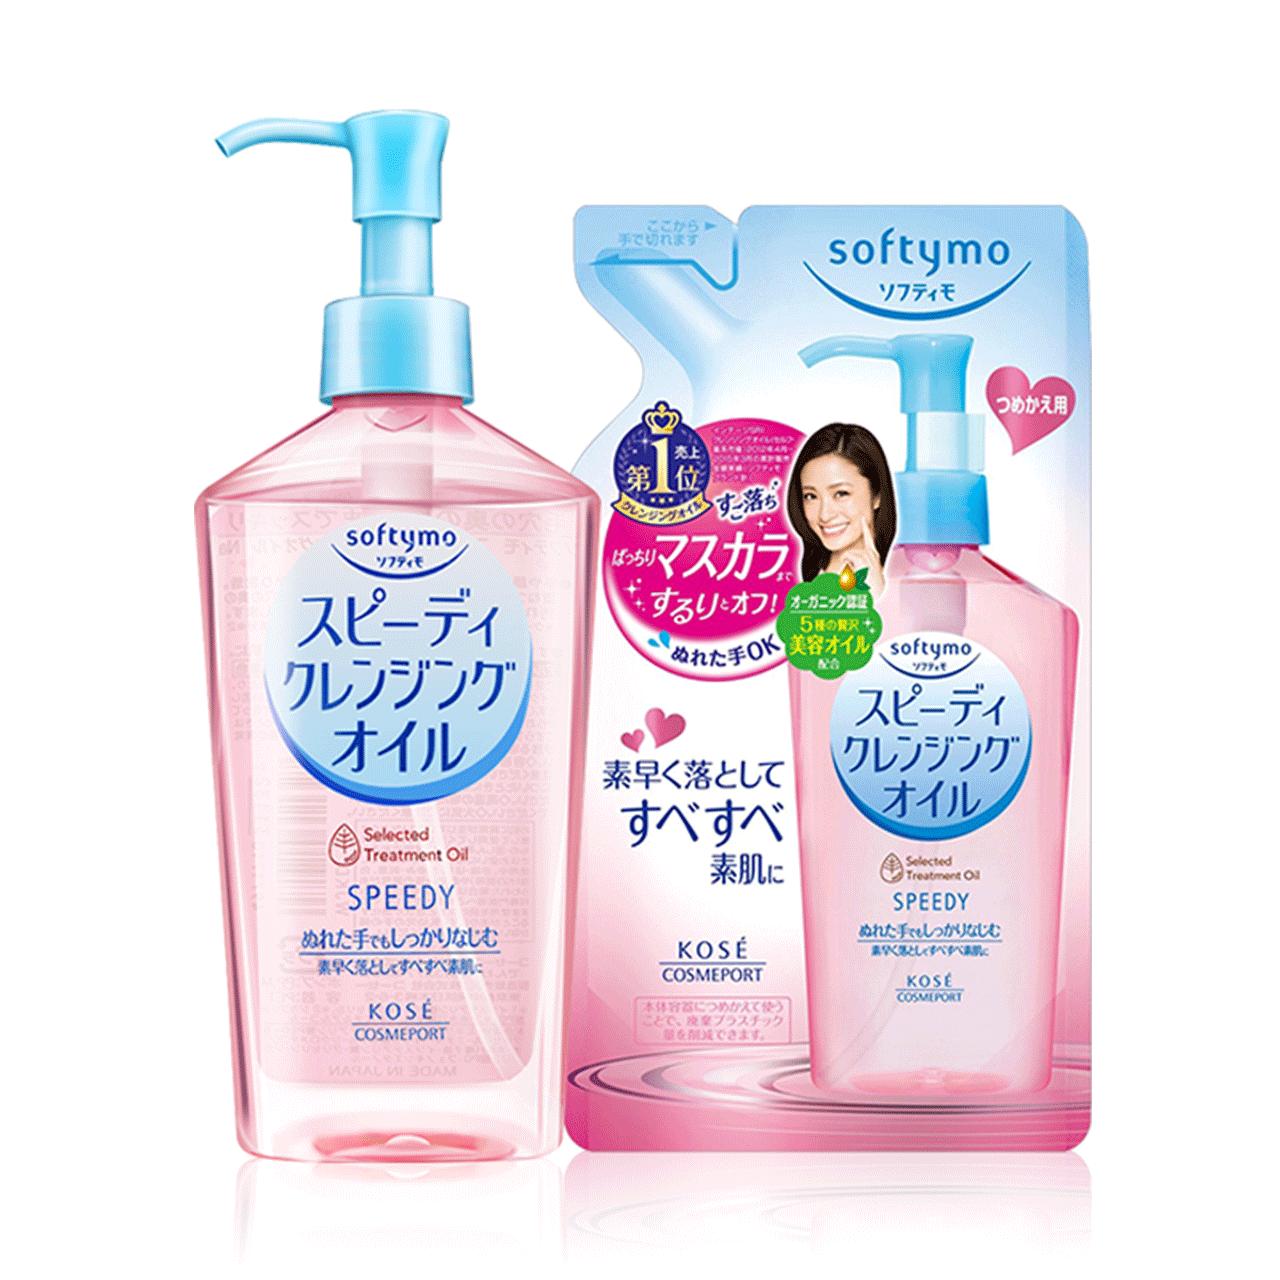 KOSE高丝卸妆油眼唇脸部温和清洁无刺激日本卸妆油学生卸妆液正品优惠券